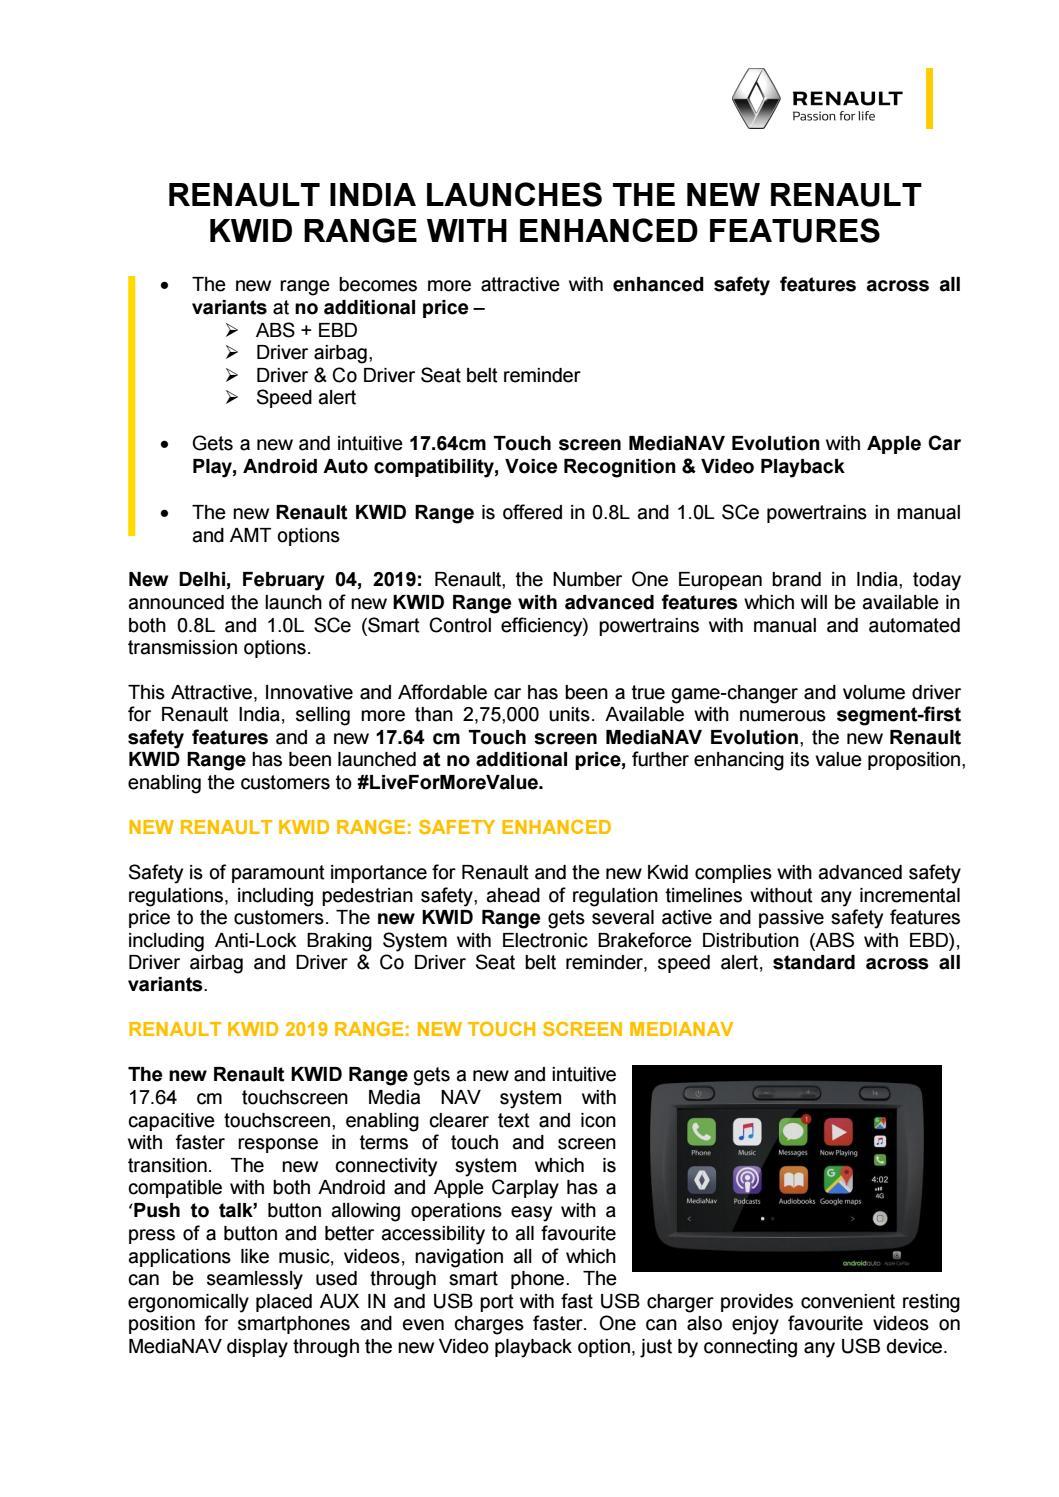 Renault India Launches the New Renault KWID Range with